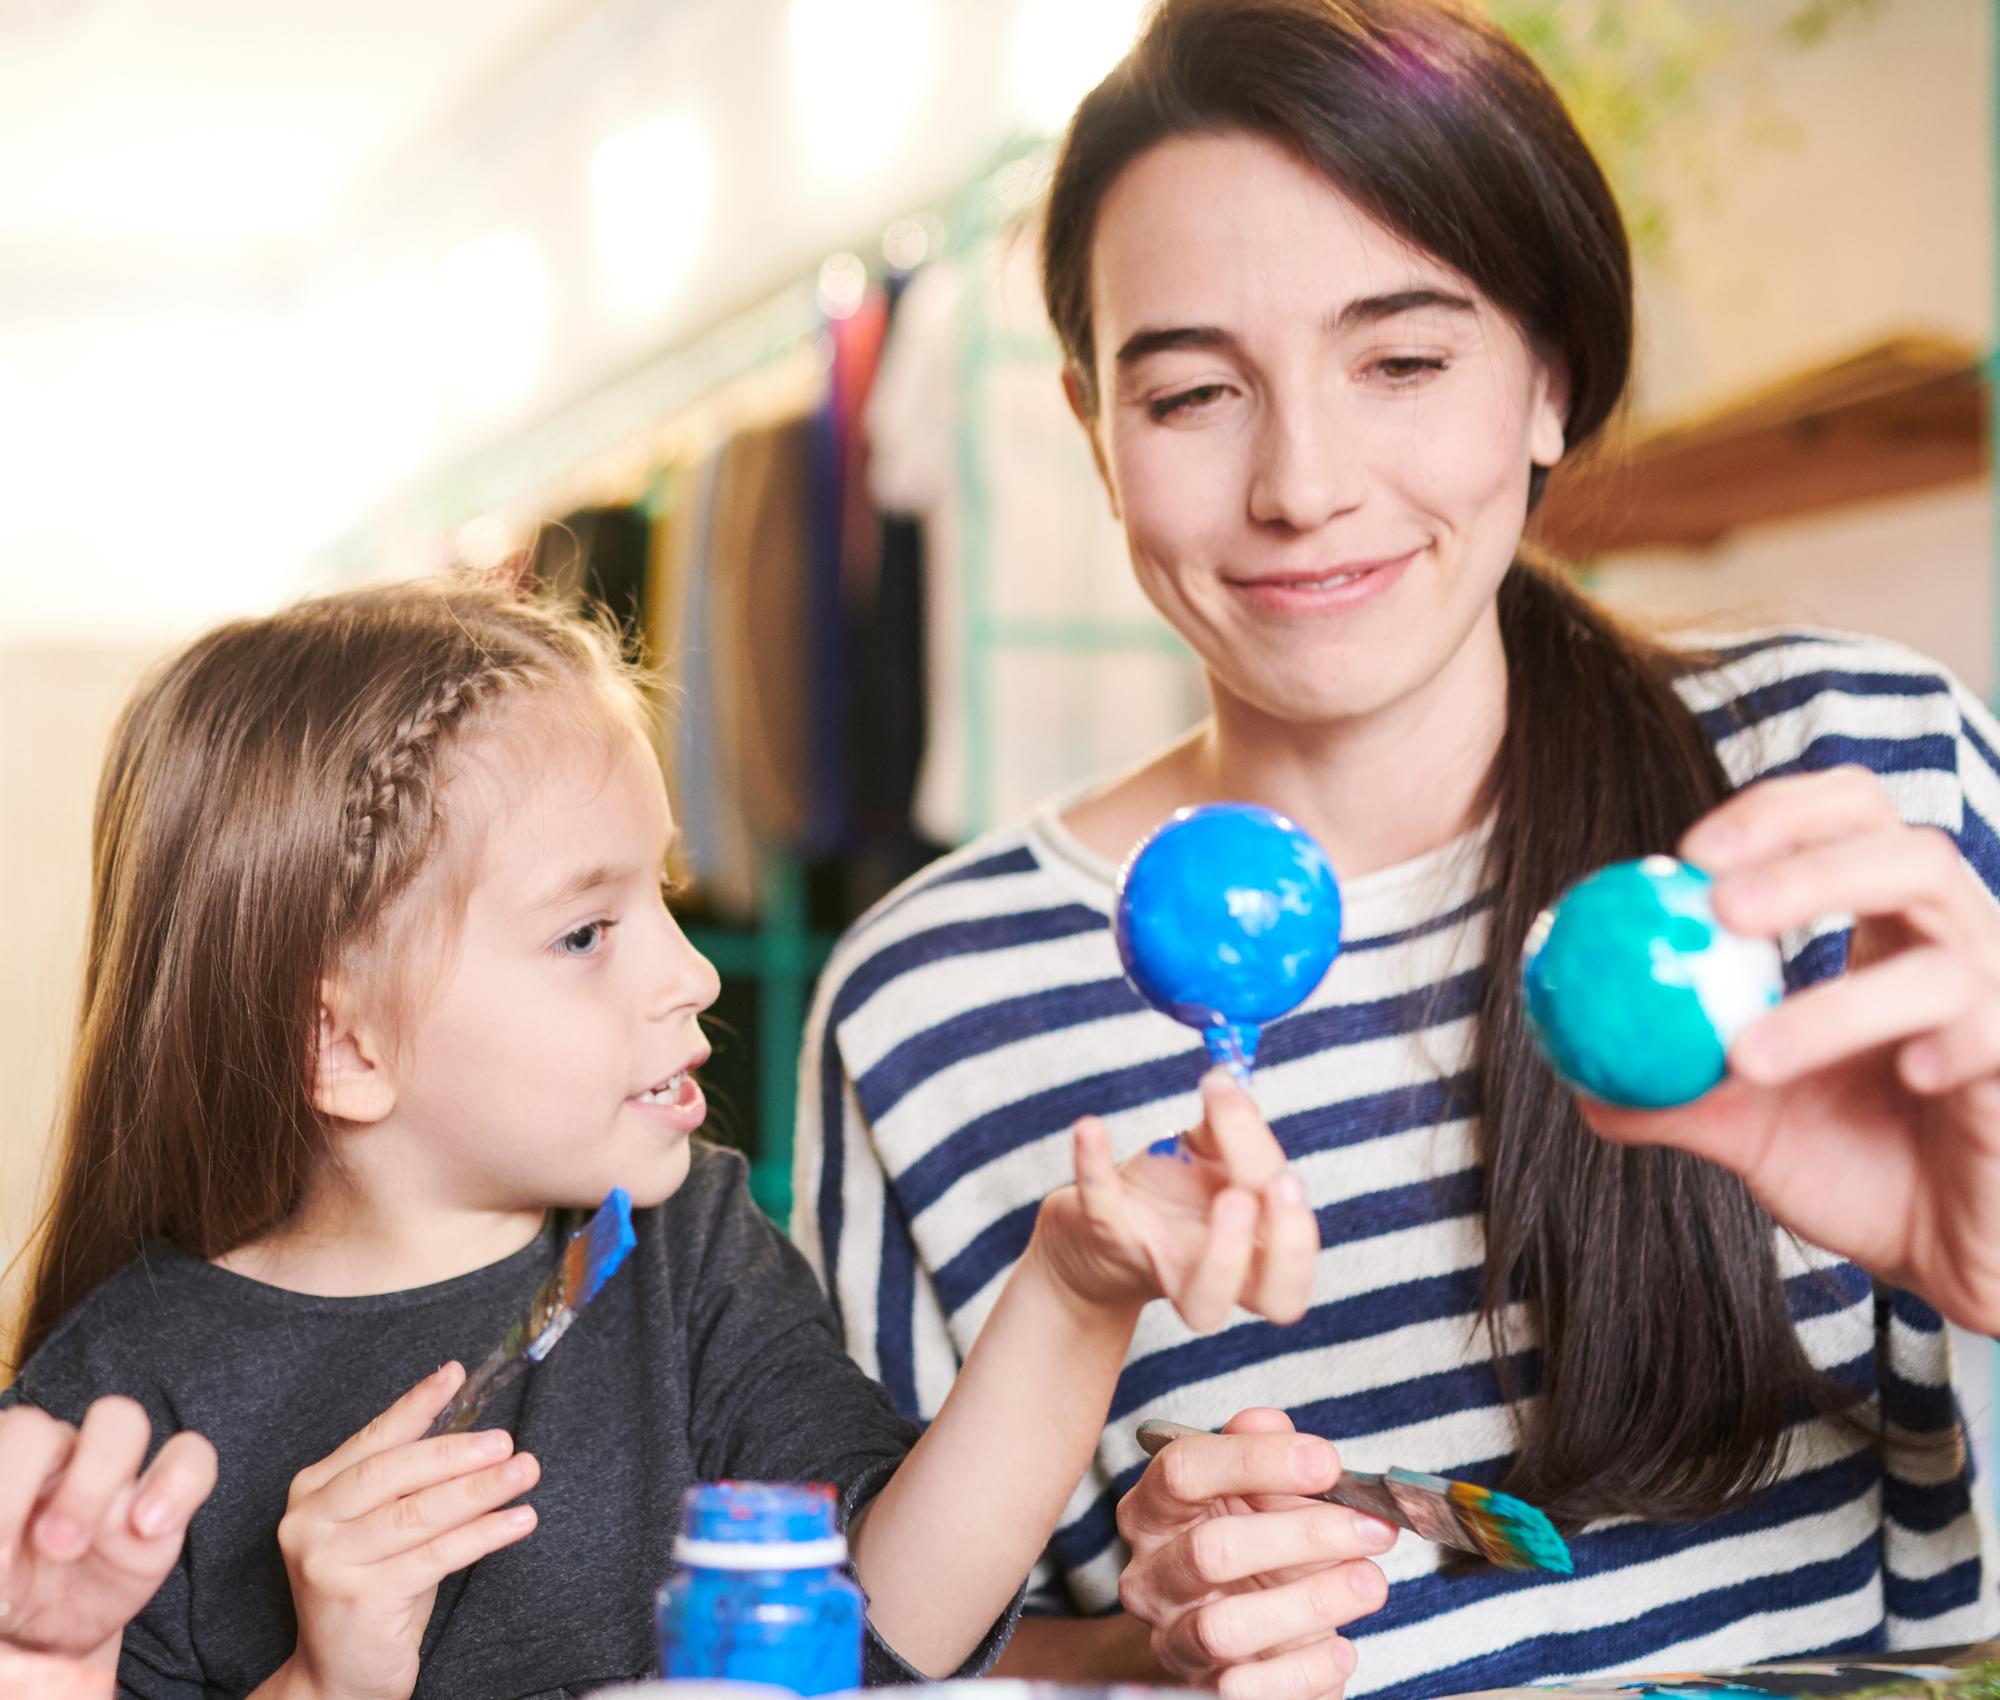 Caregiver and Child Craft Night